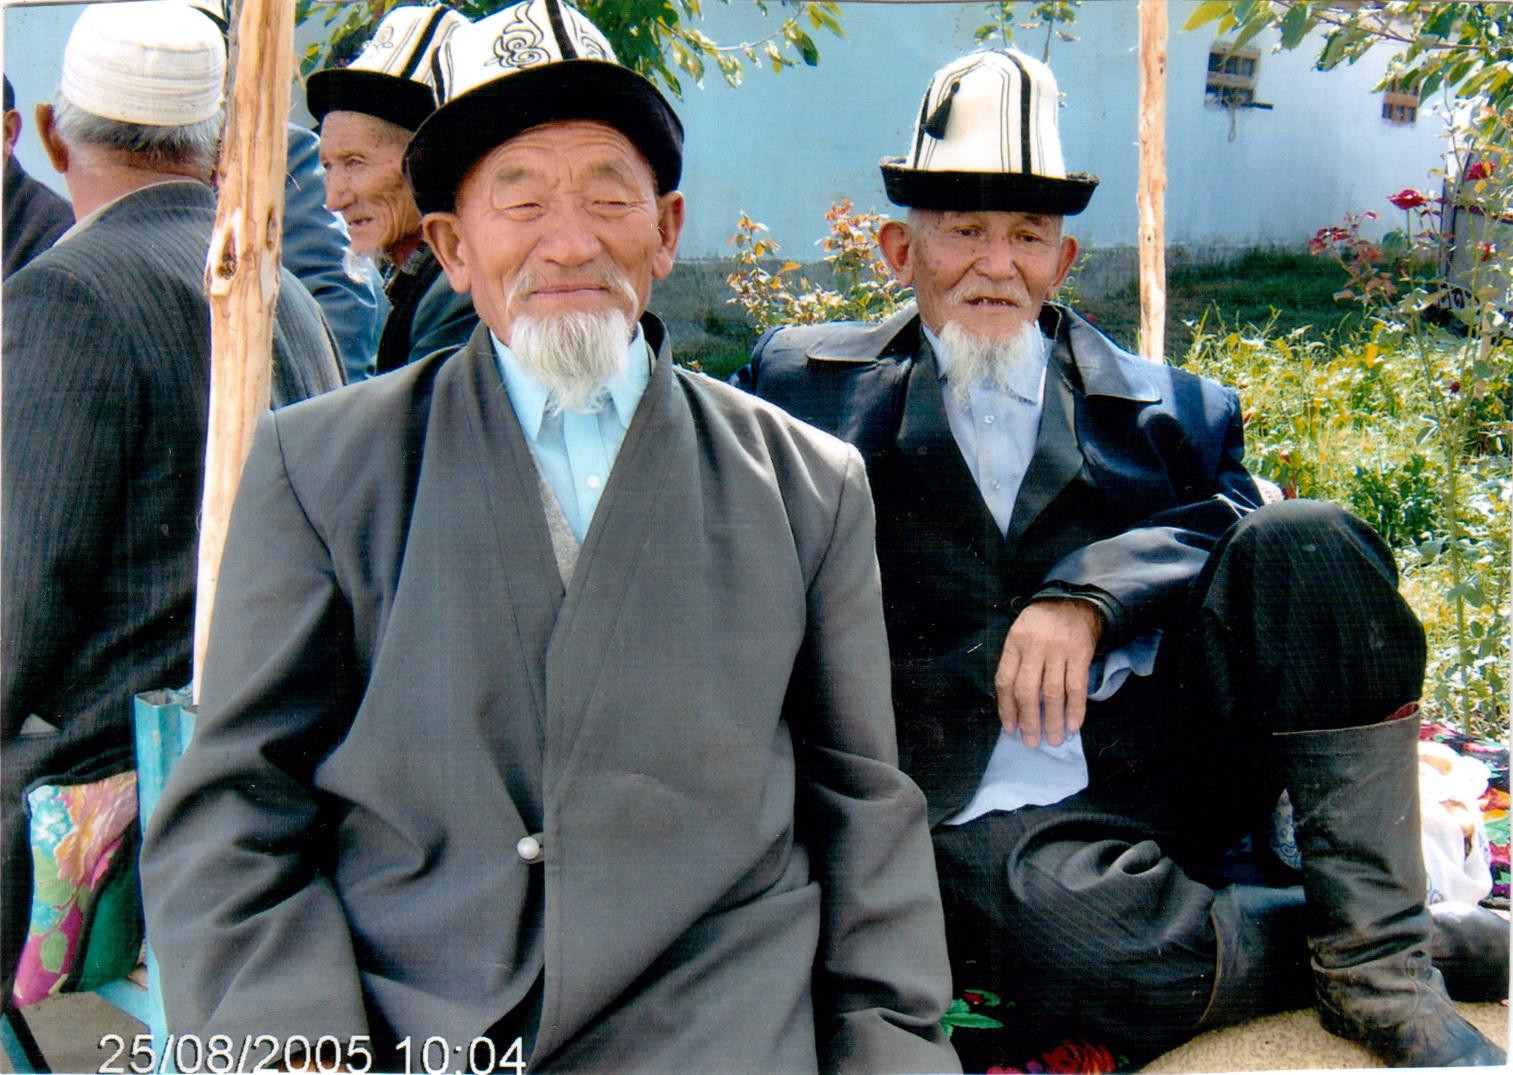 https://upload.wikimedia.org/wikipedia/ru/0/04/Kyrgyz_aksakaldar.jpg